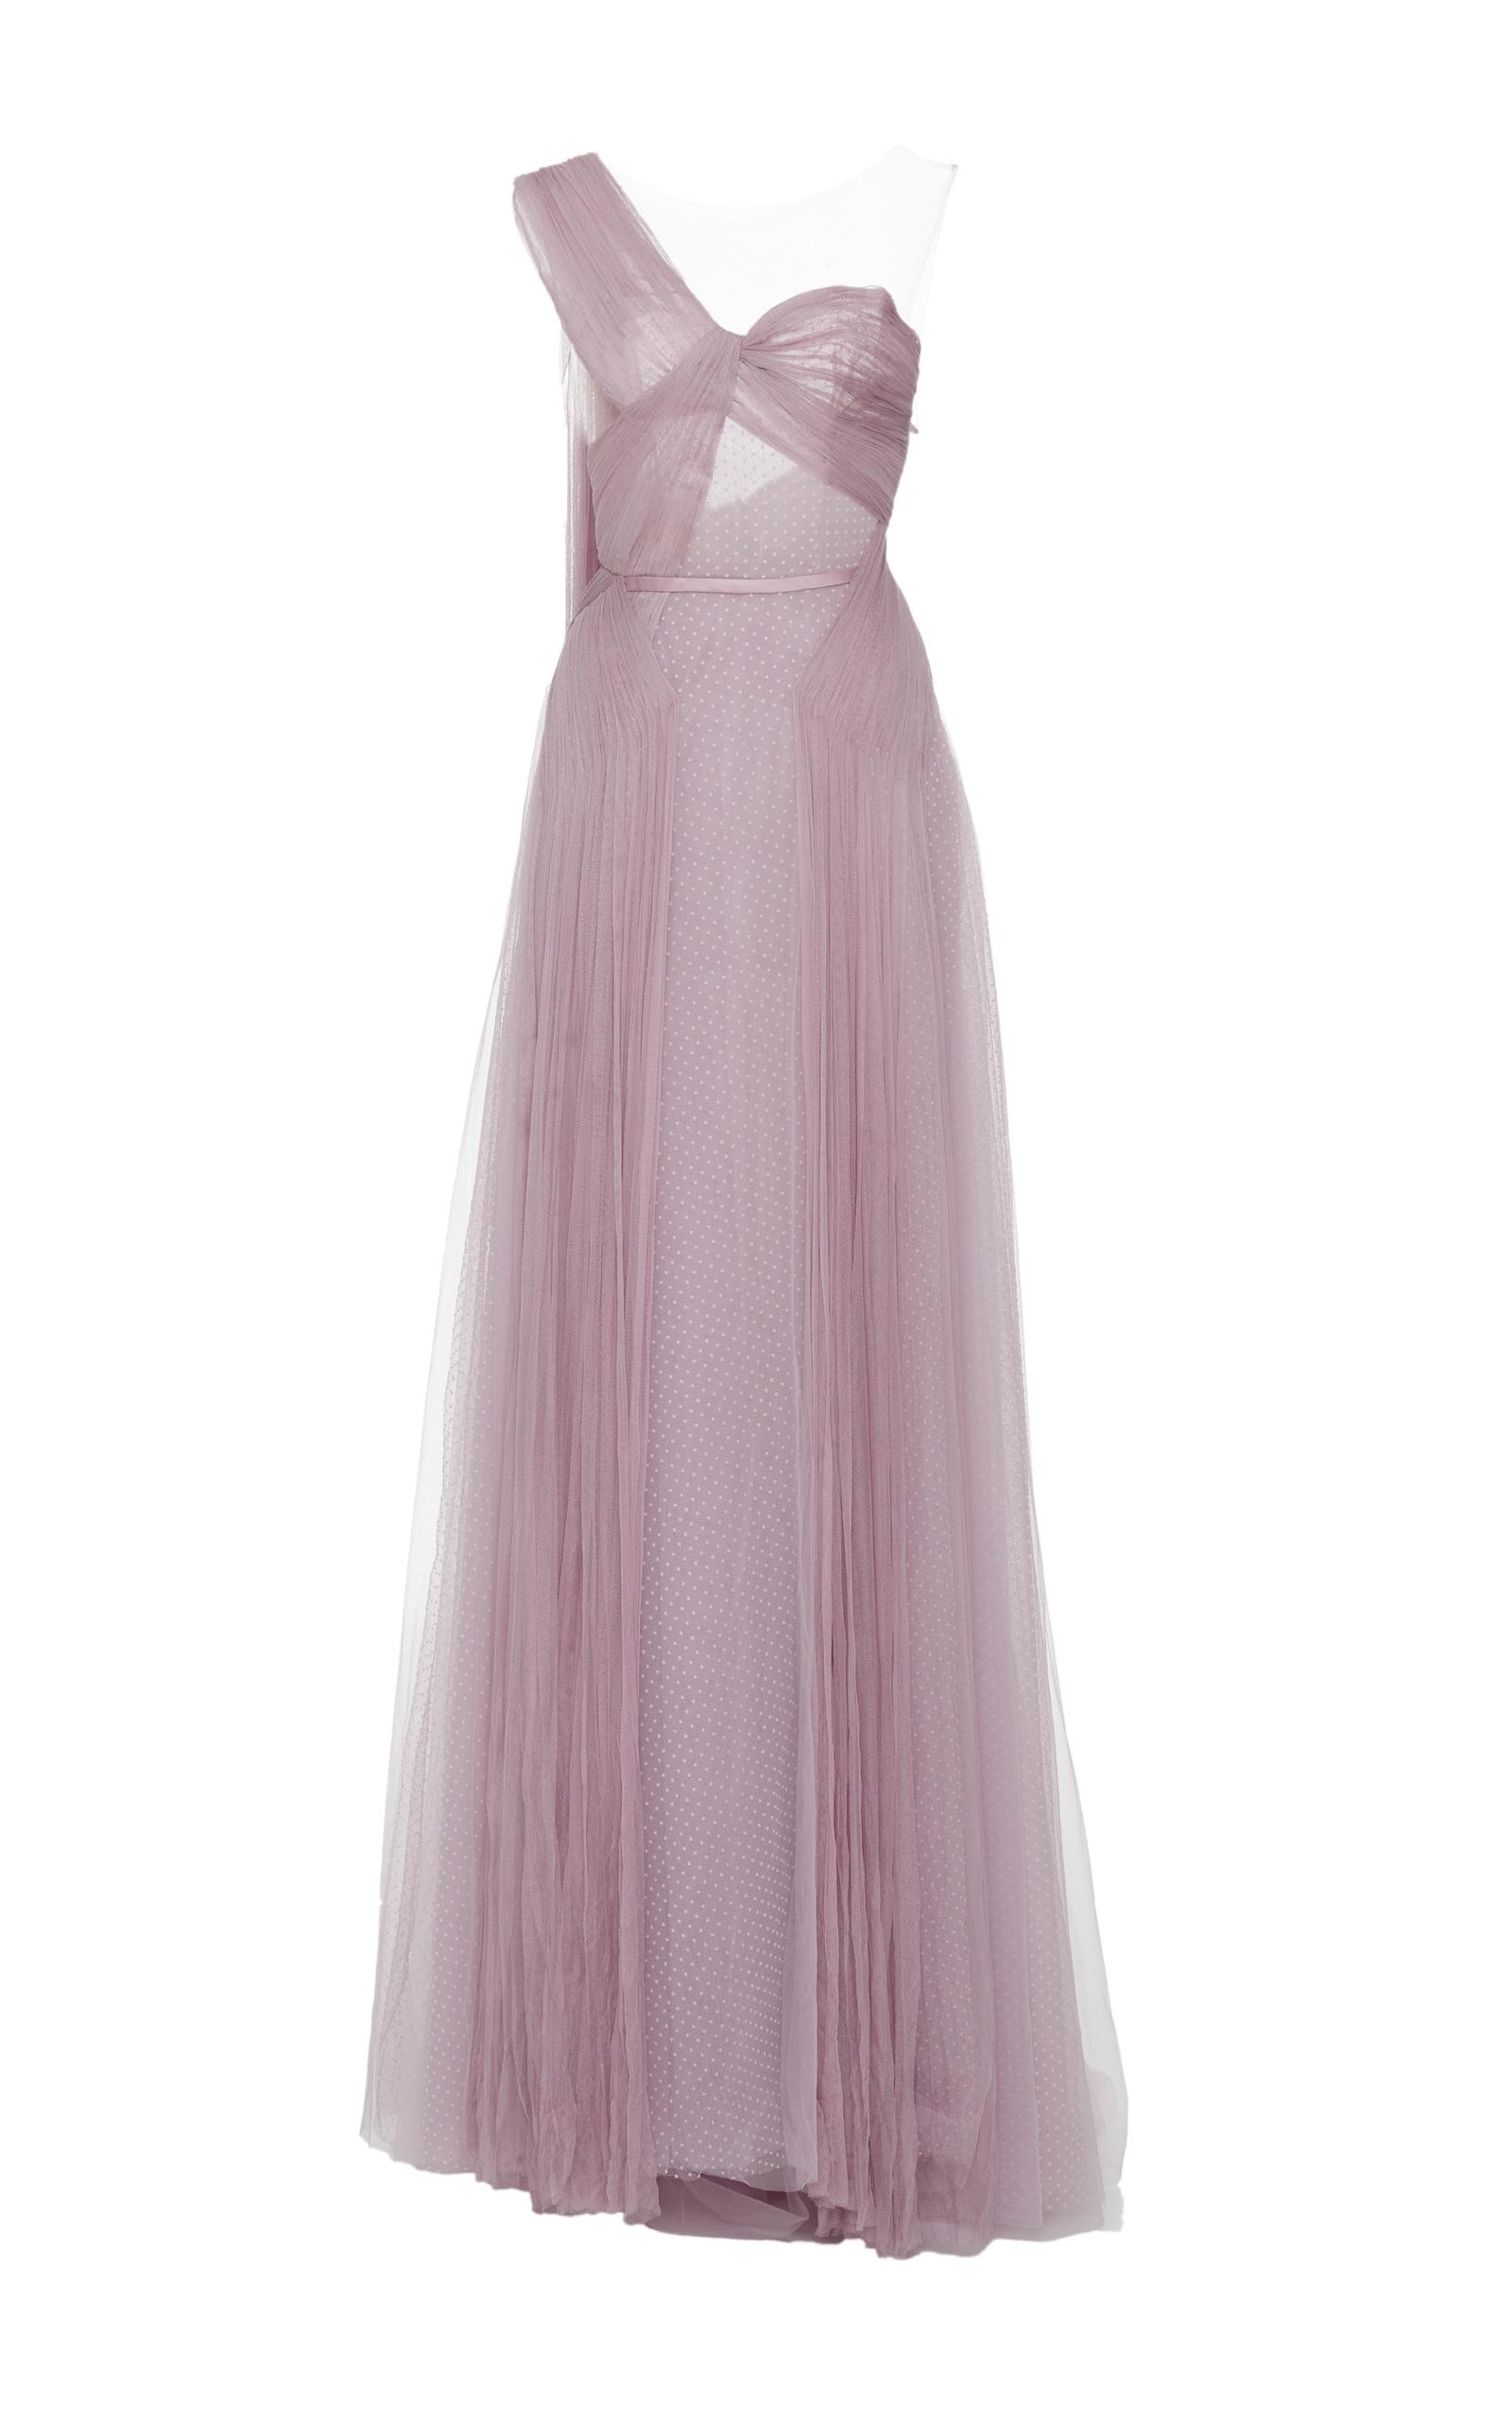 A Lavender Spell Gown by Hamda Al Fahim | Moda Operandi